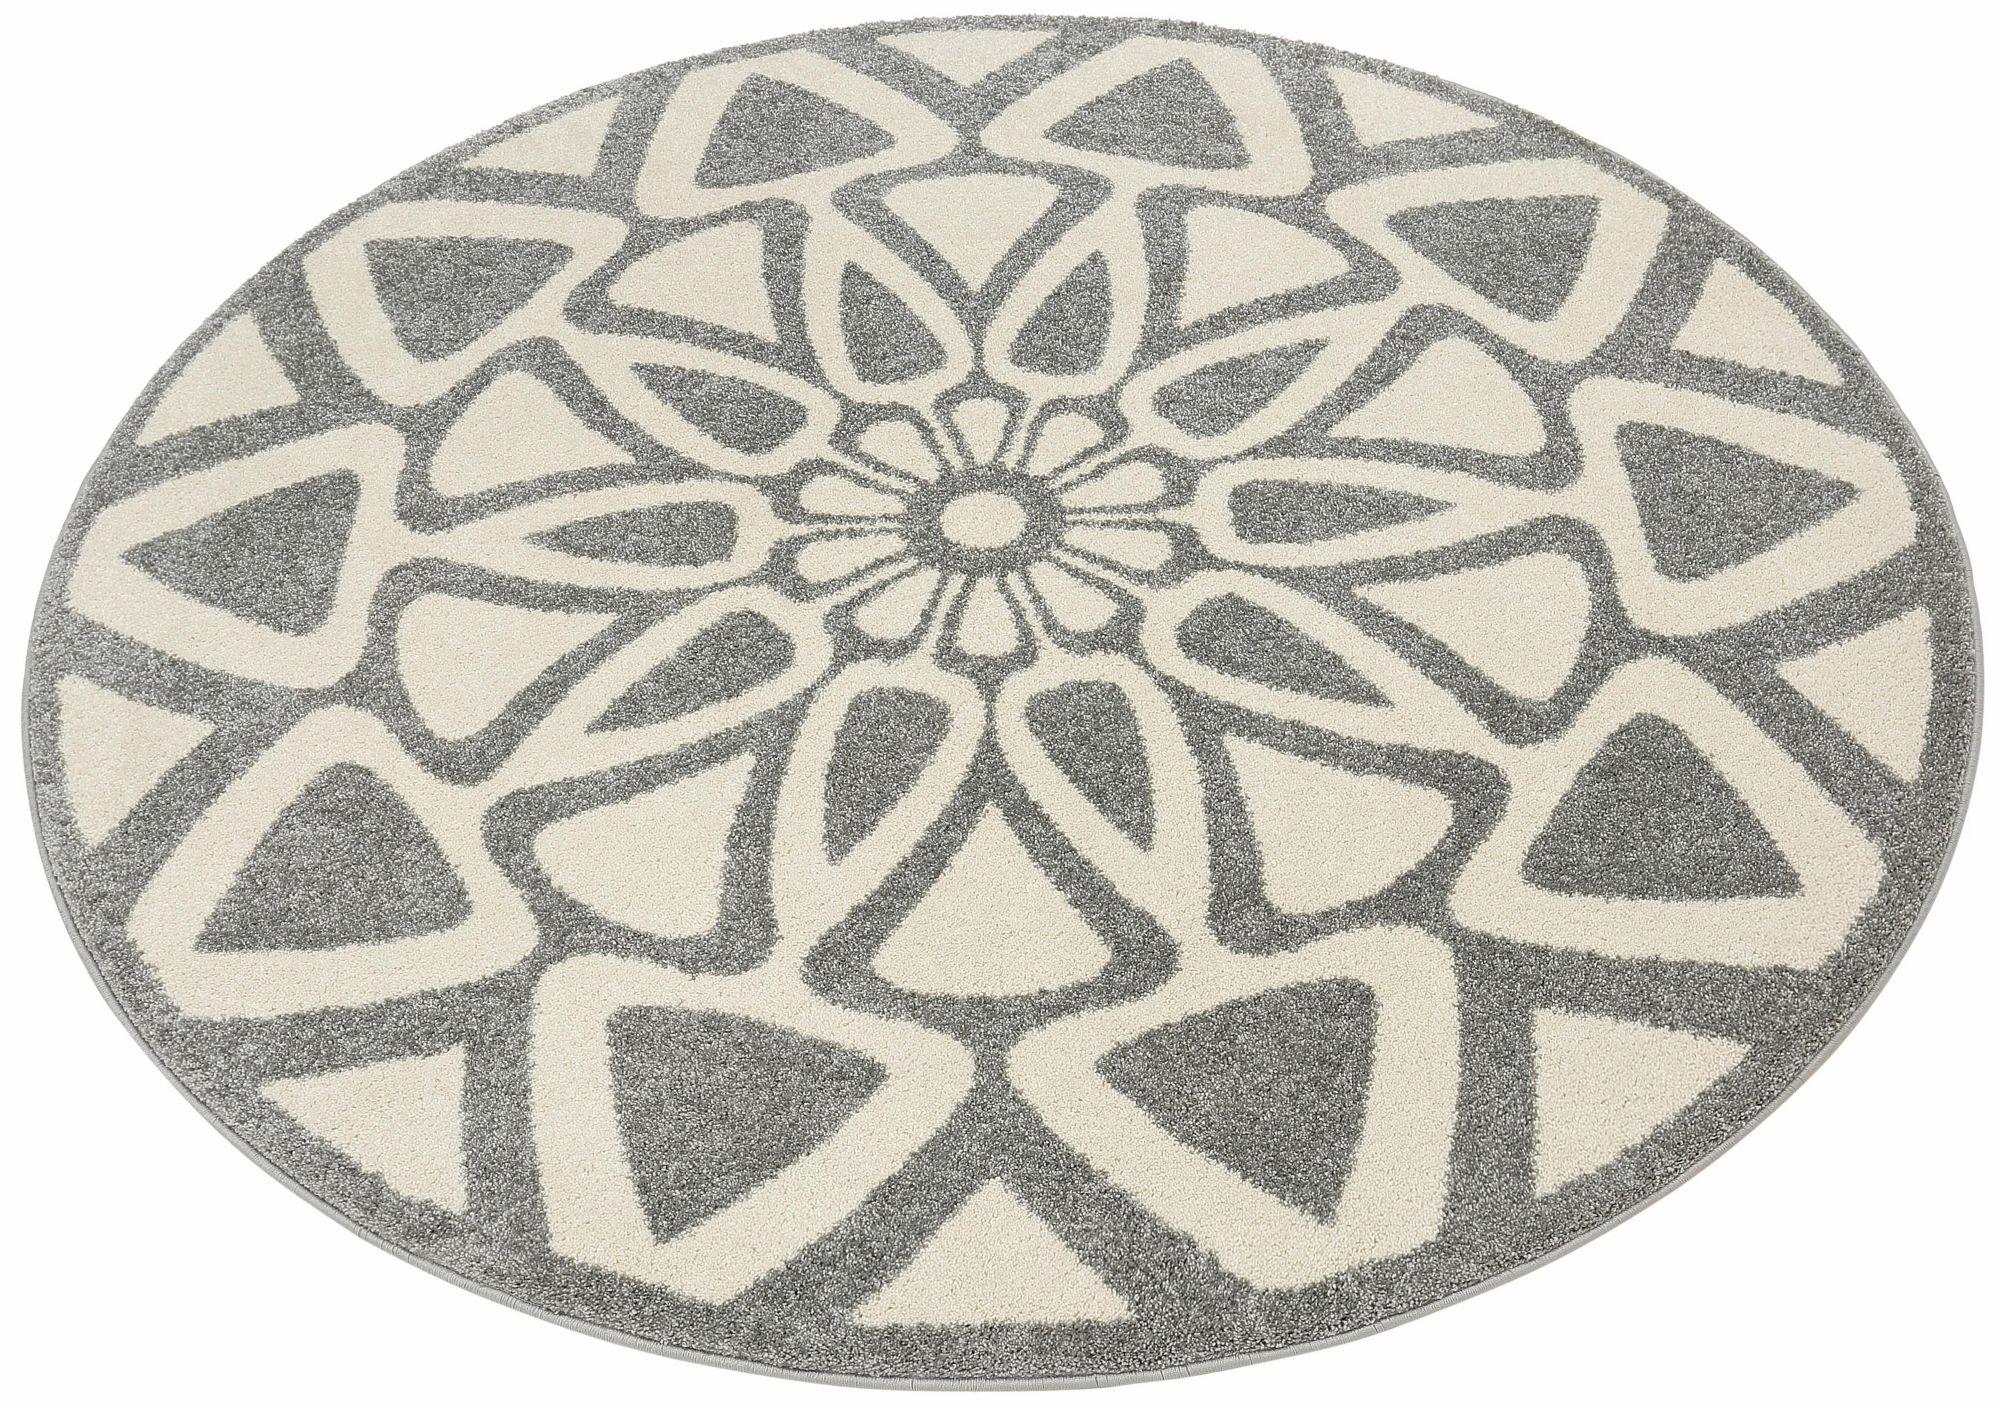 HOME AFFAIRE COLLECTION Teppich, rund, Home affaire Collection, »Talea«, gewebt